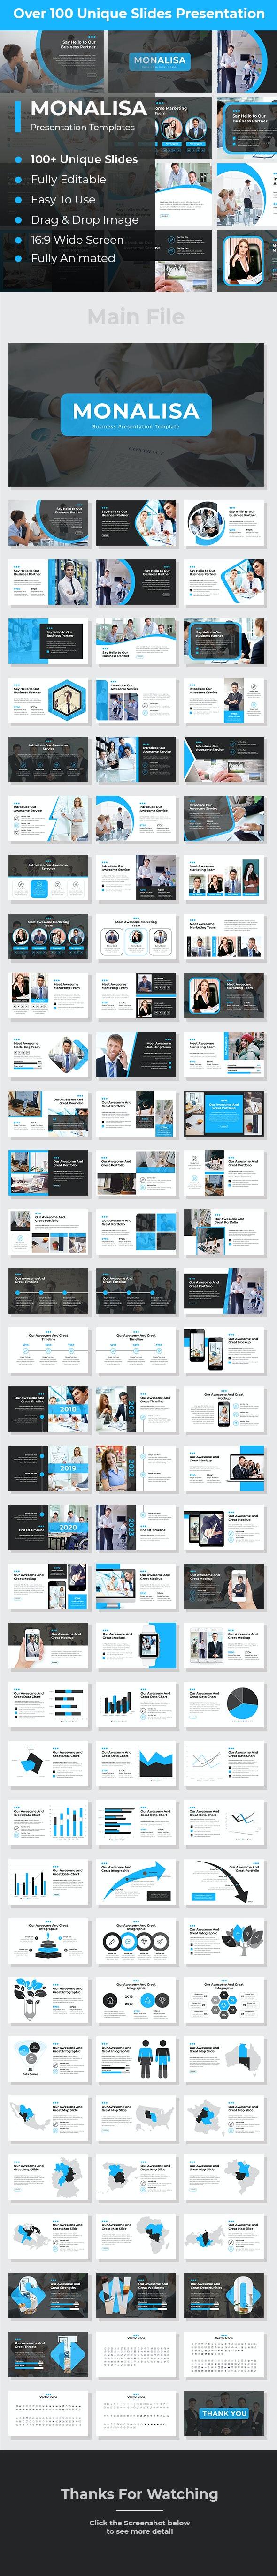 Monalisa Business Google Slides - Google Slides Presentation Templates